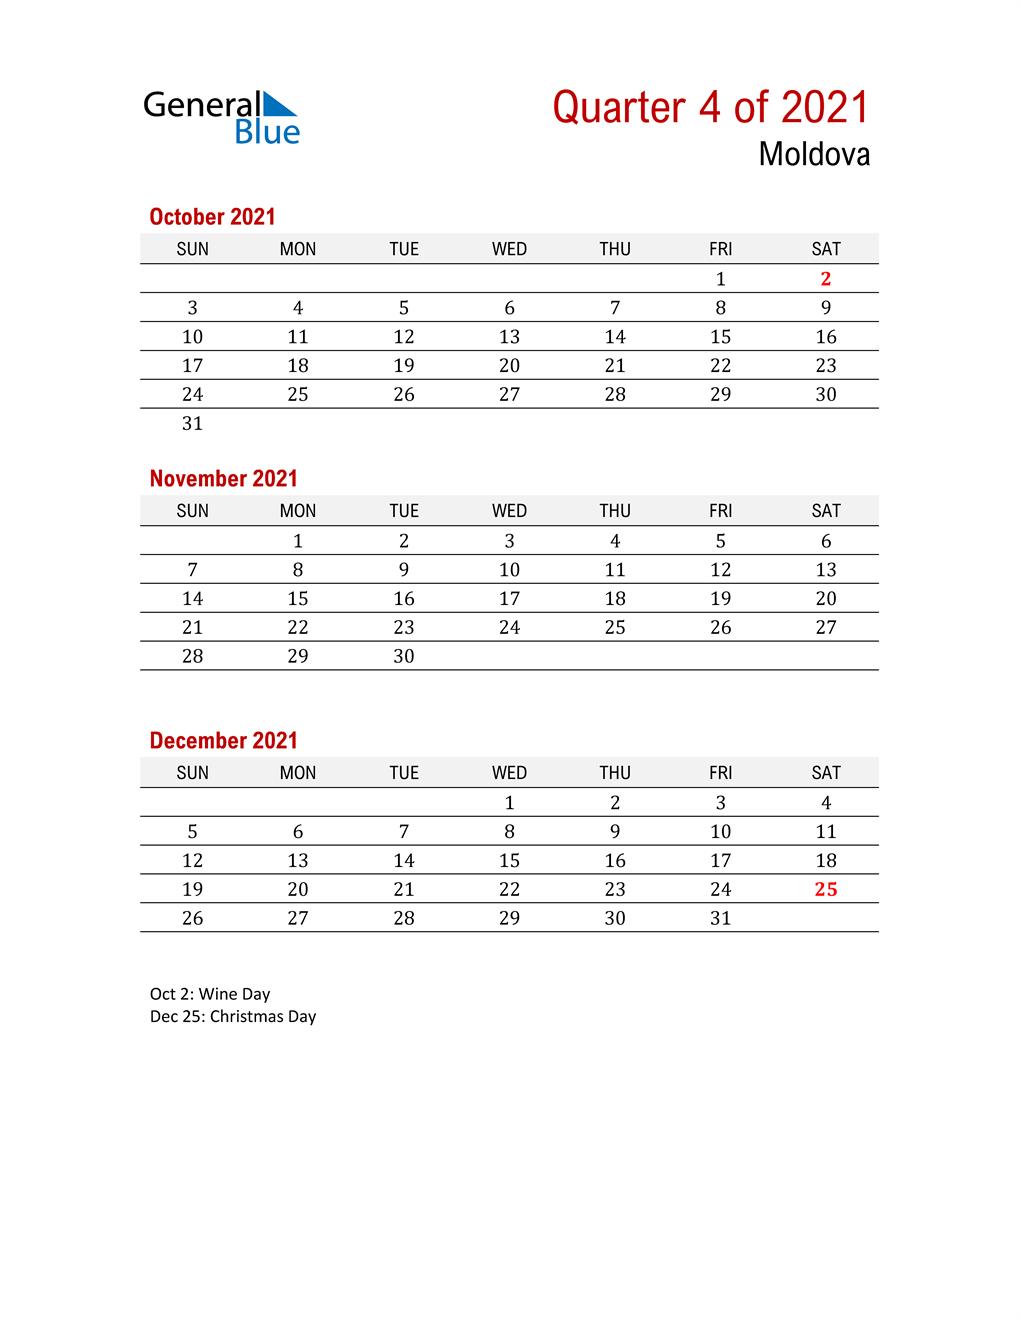 Printable Three Month Calendar for Moldova